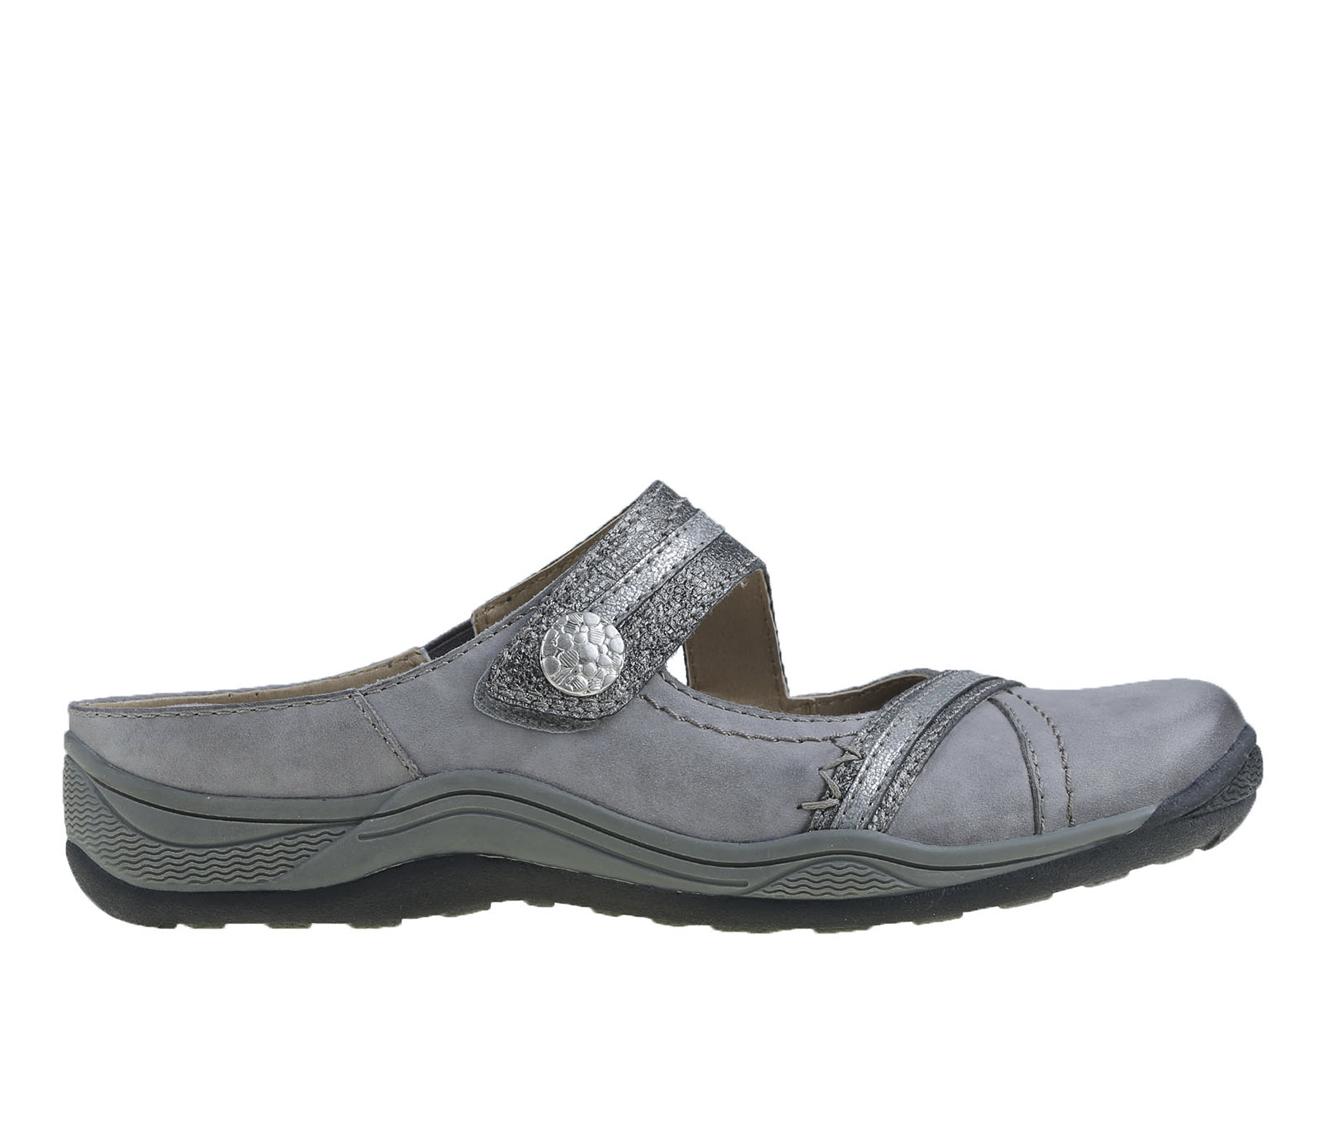 Earth Origins Clara Chloe Women's Shoe (Gray Leather)